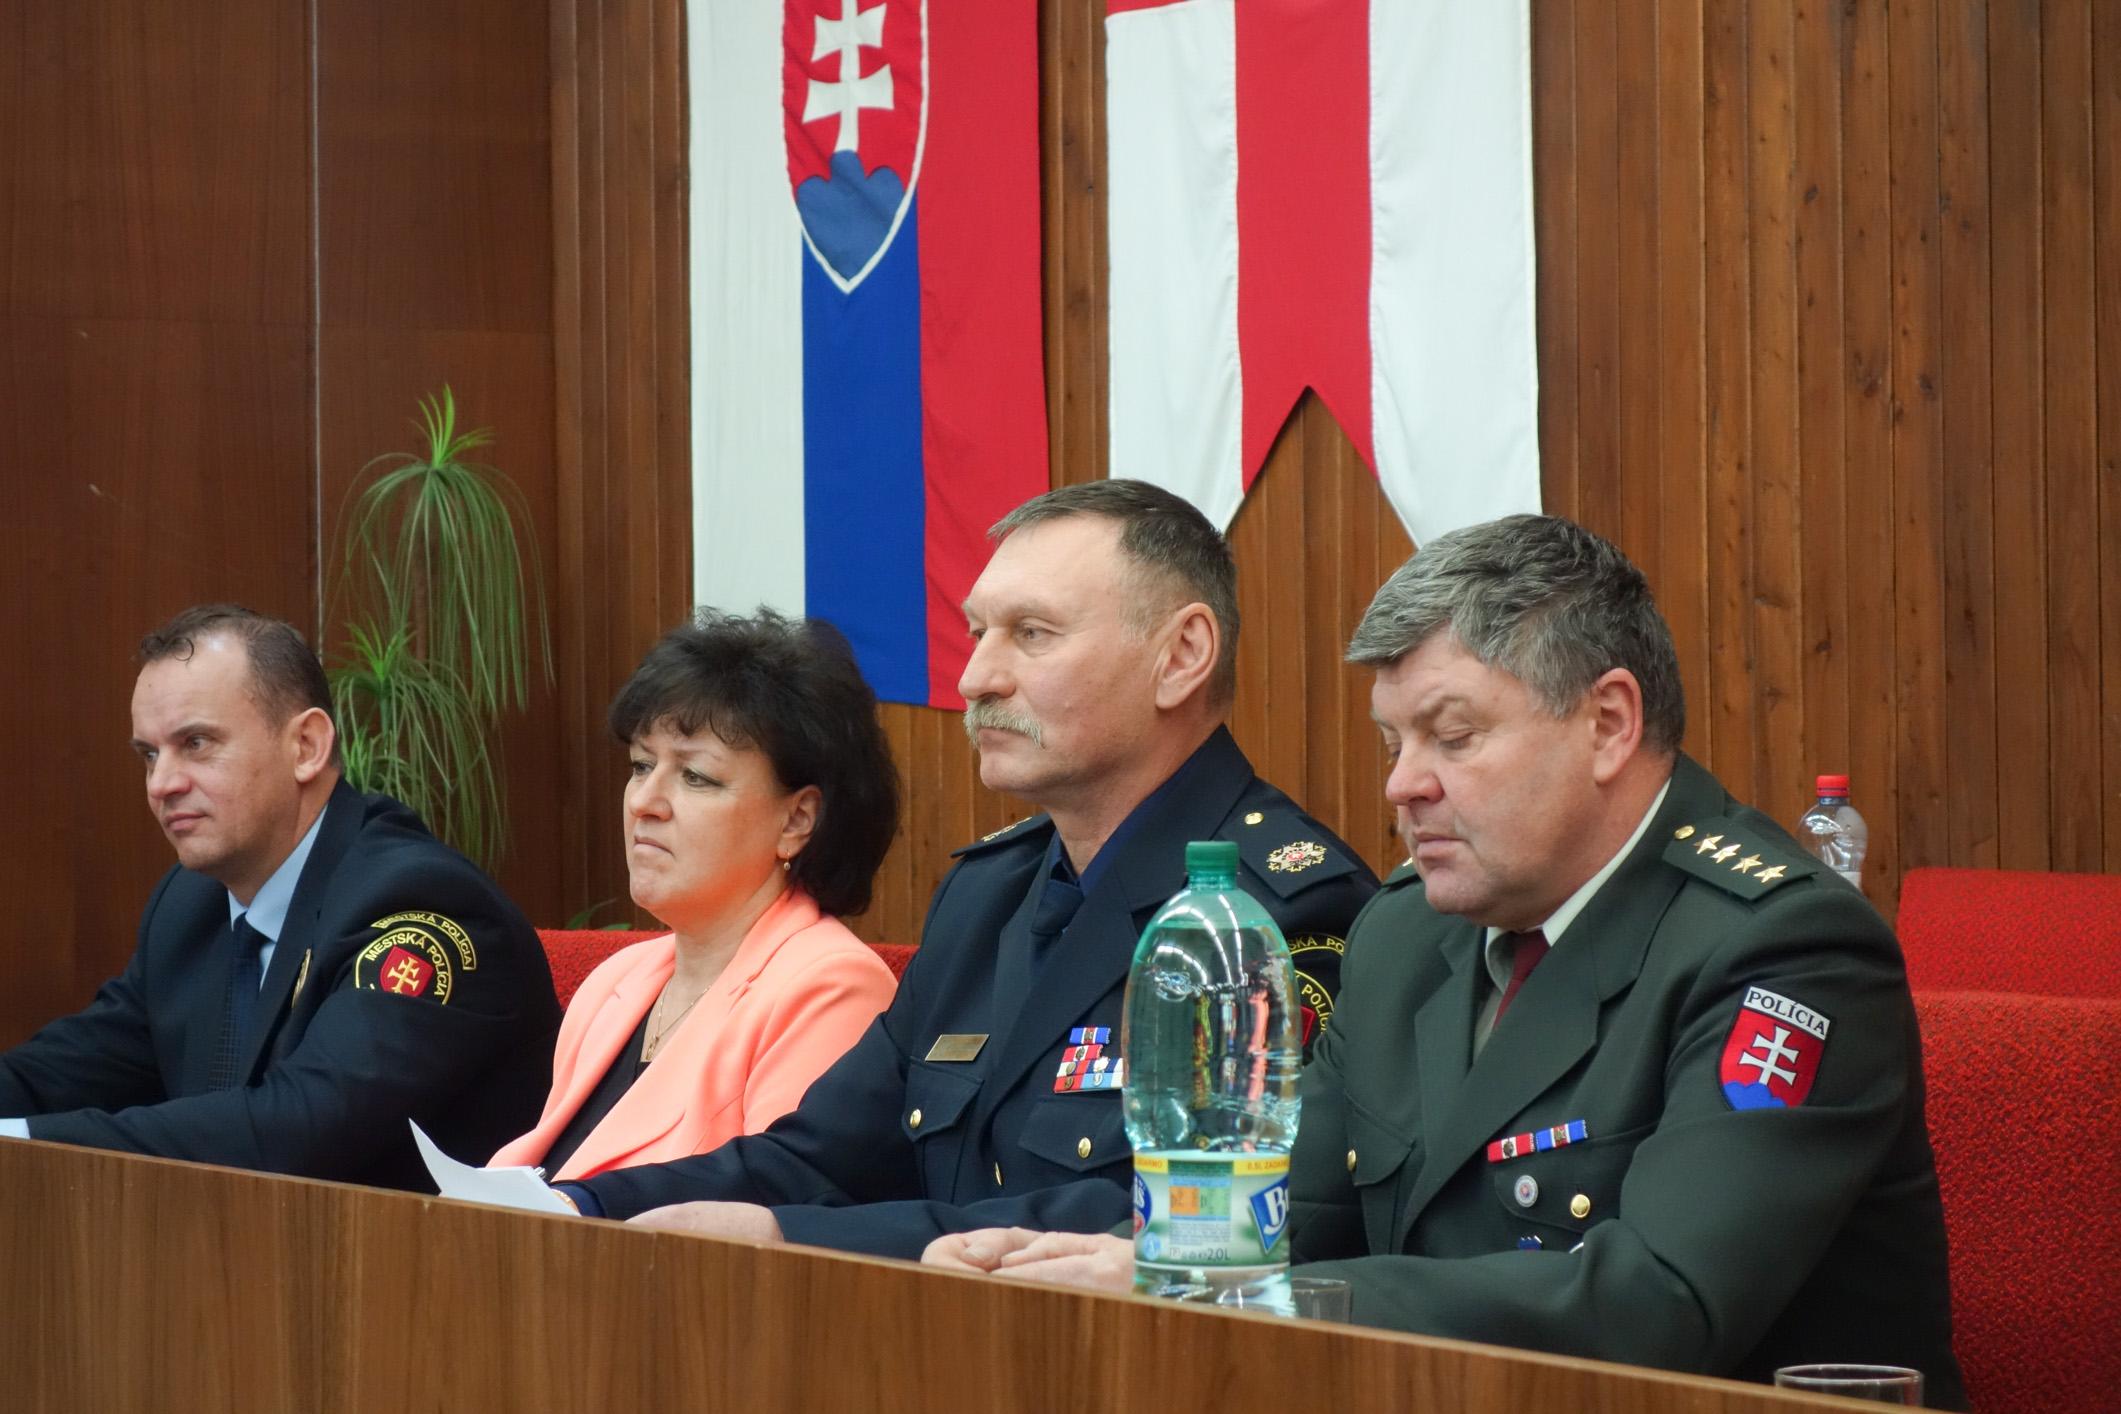 chabada-balkovicova-michalik-lietava